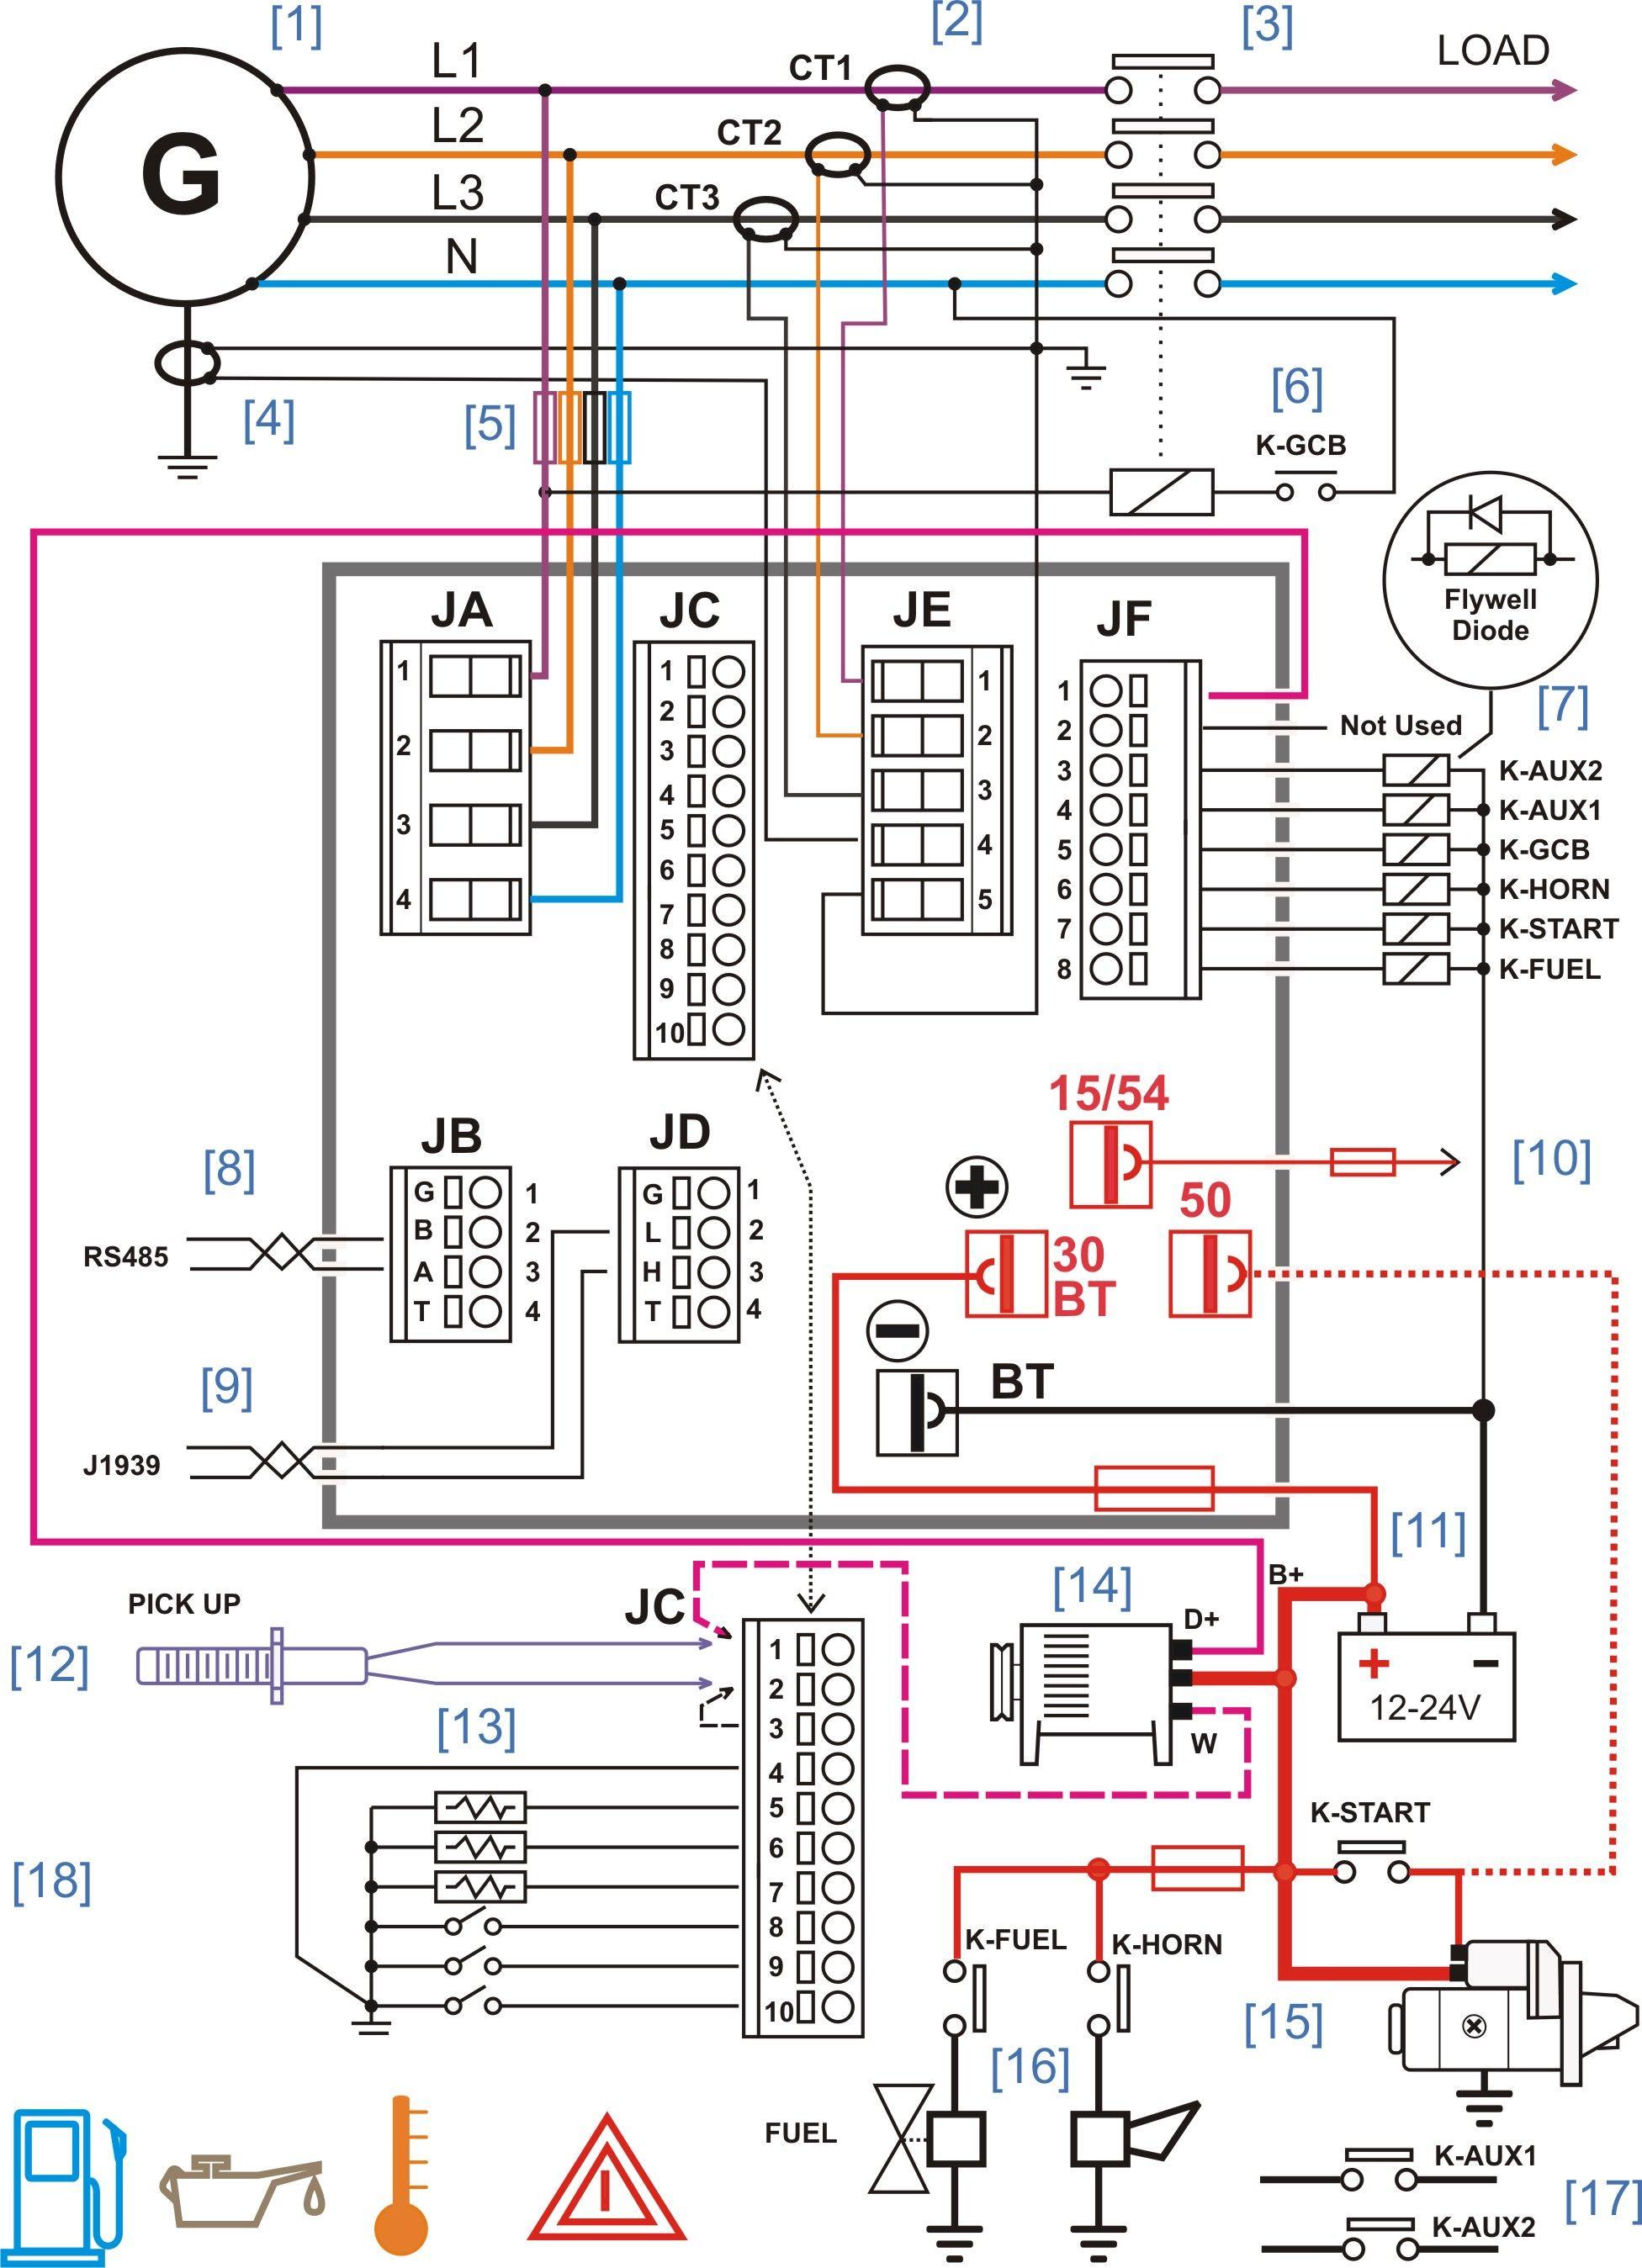 inverter generator wiring diagram Download-Diesel Generator Control Panel Wiring Diagram 16-k